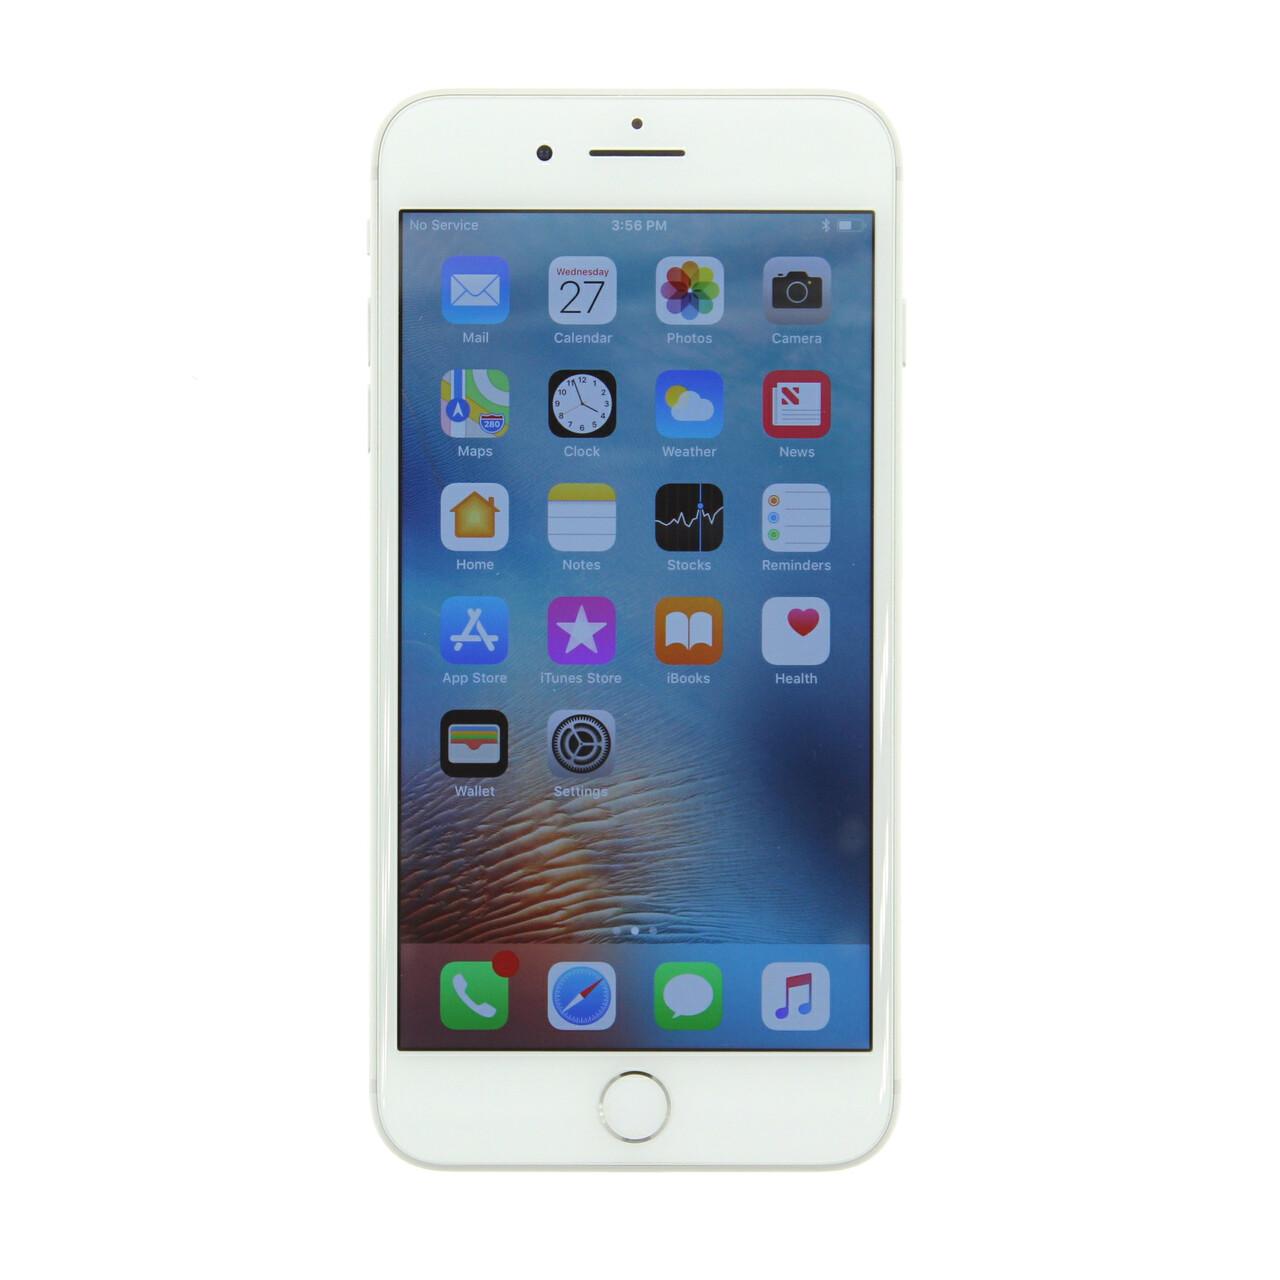 Apple iPhone 8 Plus a1864 256GB CDMA/GSM Unlocked-Very Good